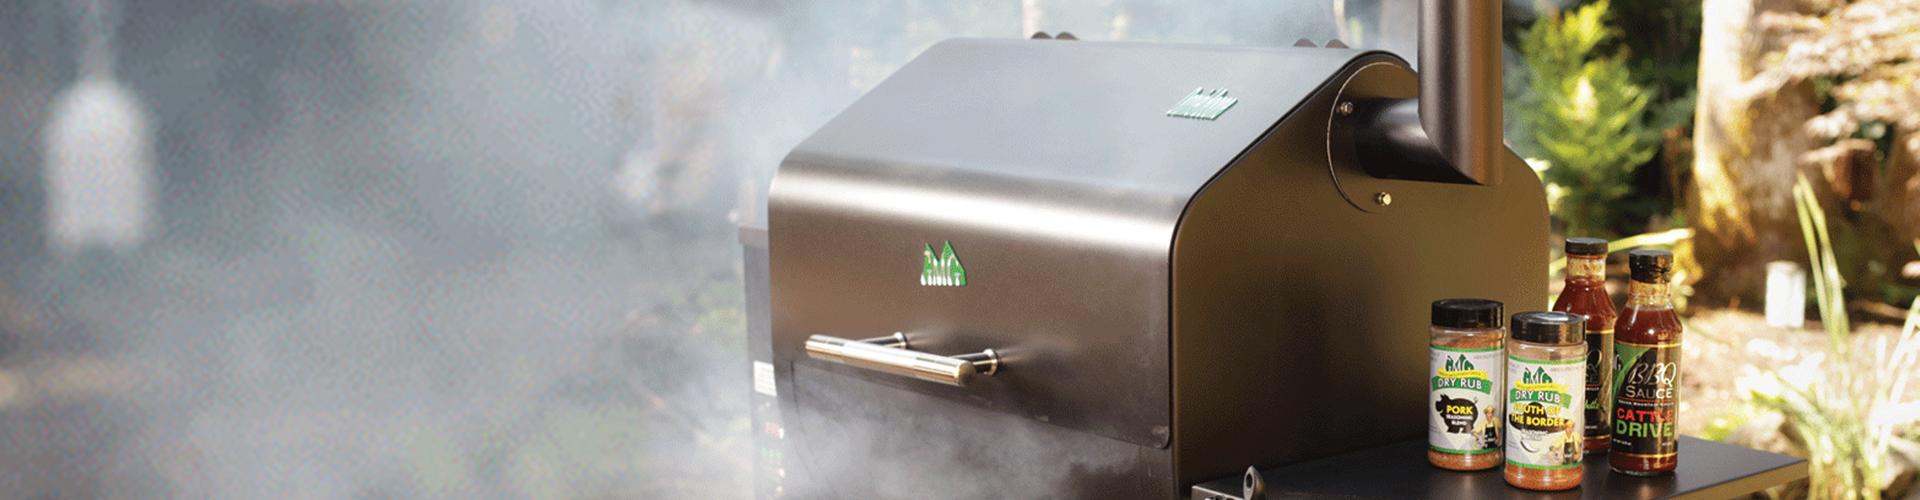 Grills BBQs Smokers